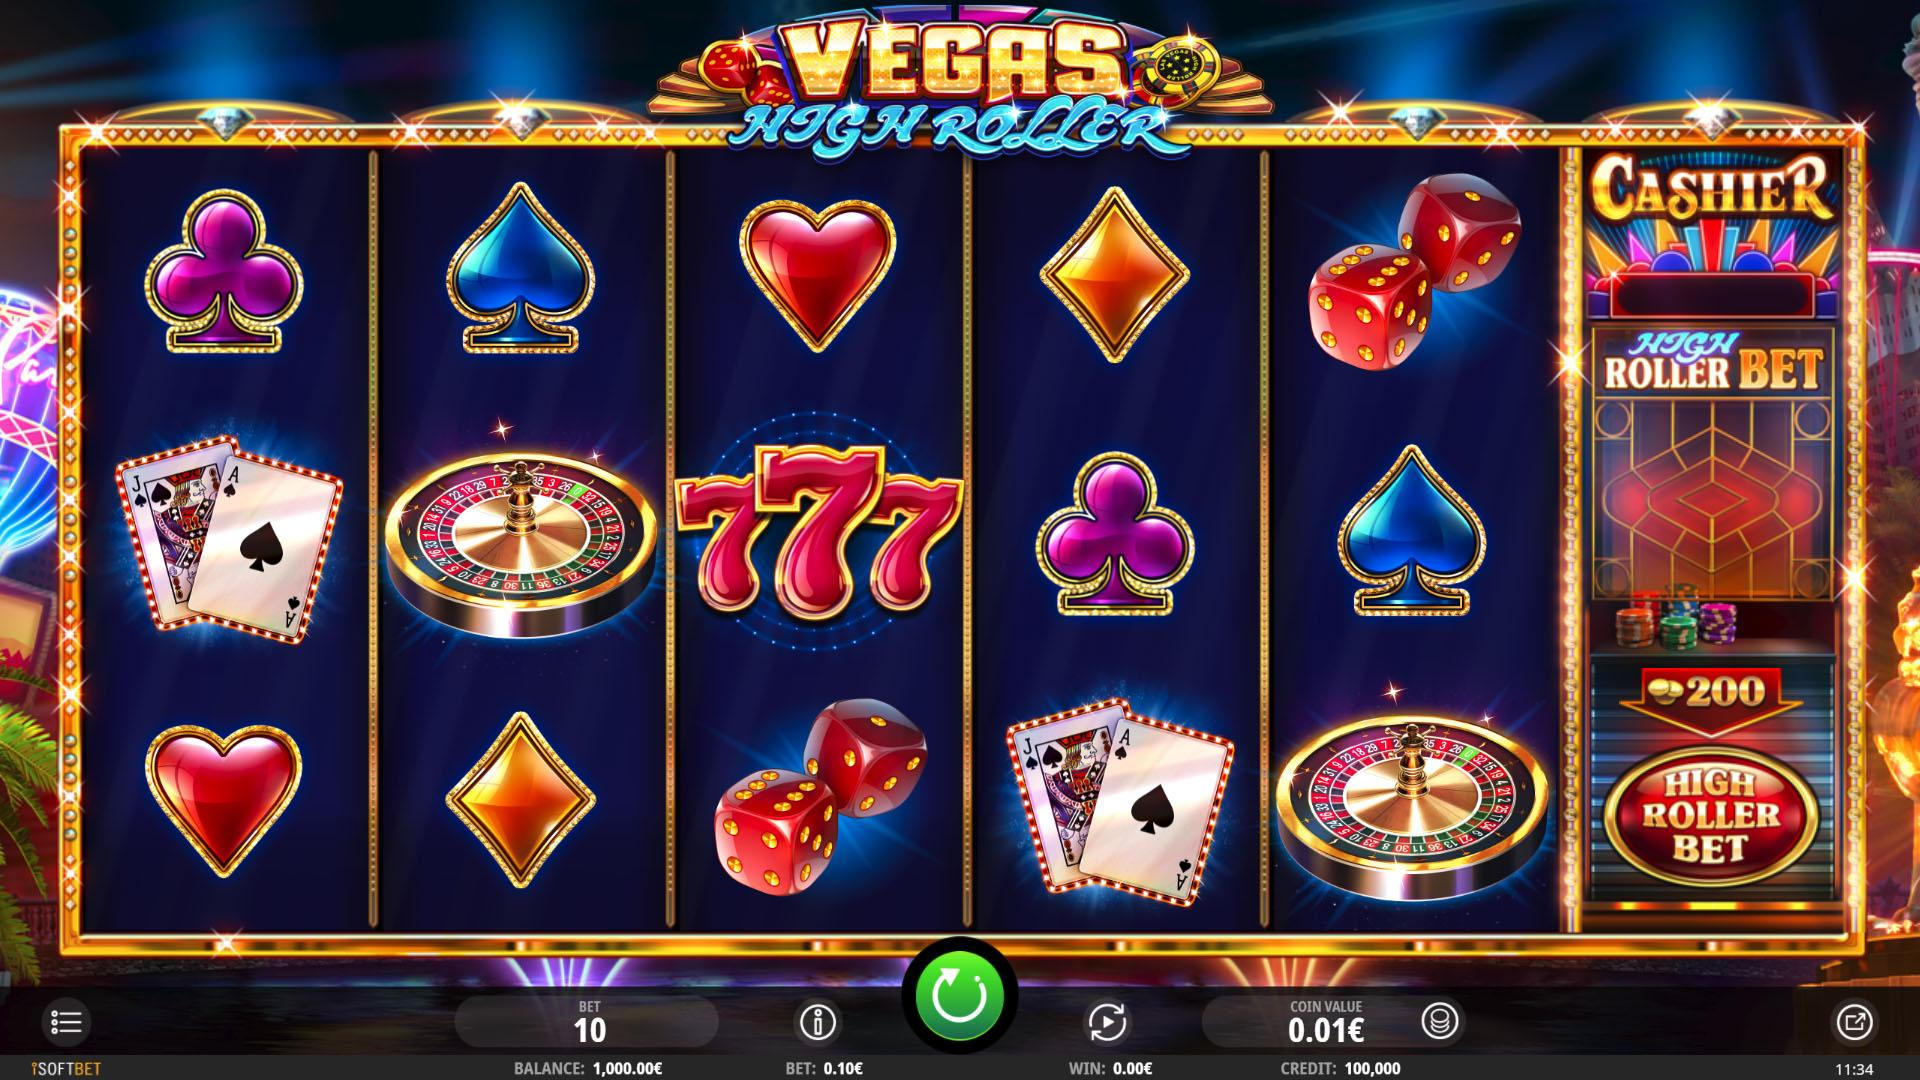 SoftGamings IsoftBet Vegas High Roller